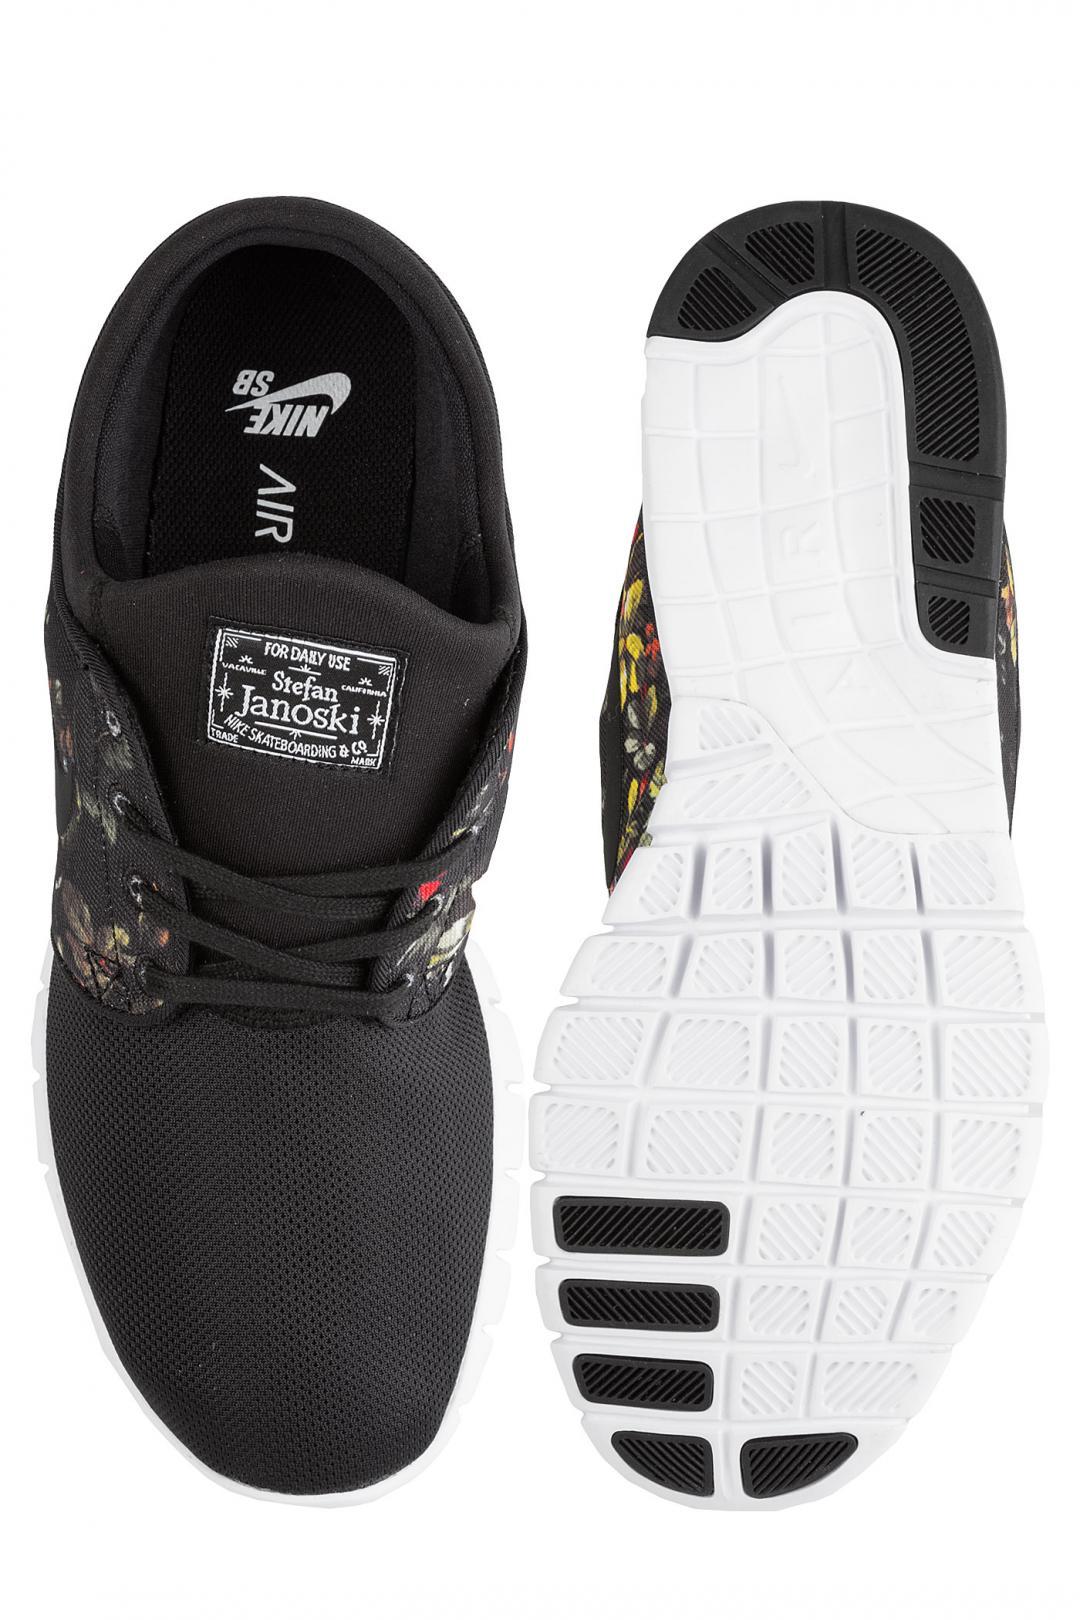 Uomo Nike SB Stefan Janoski Max black multi color floral | Sneakers low top